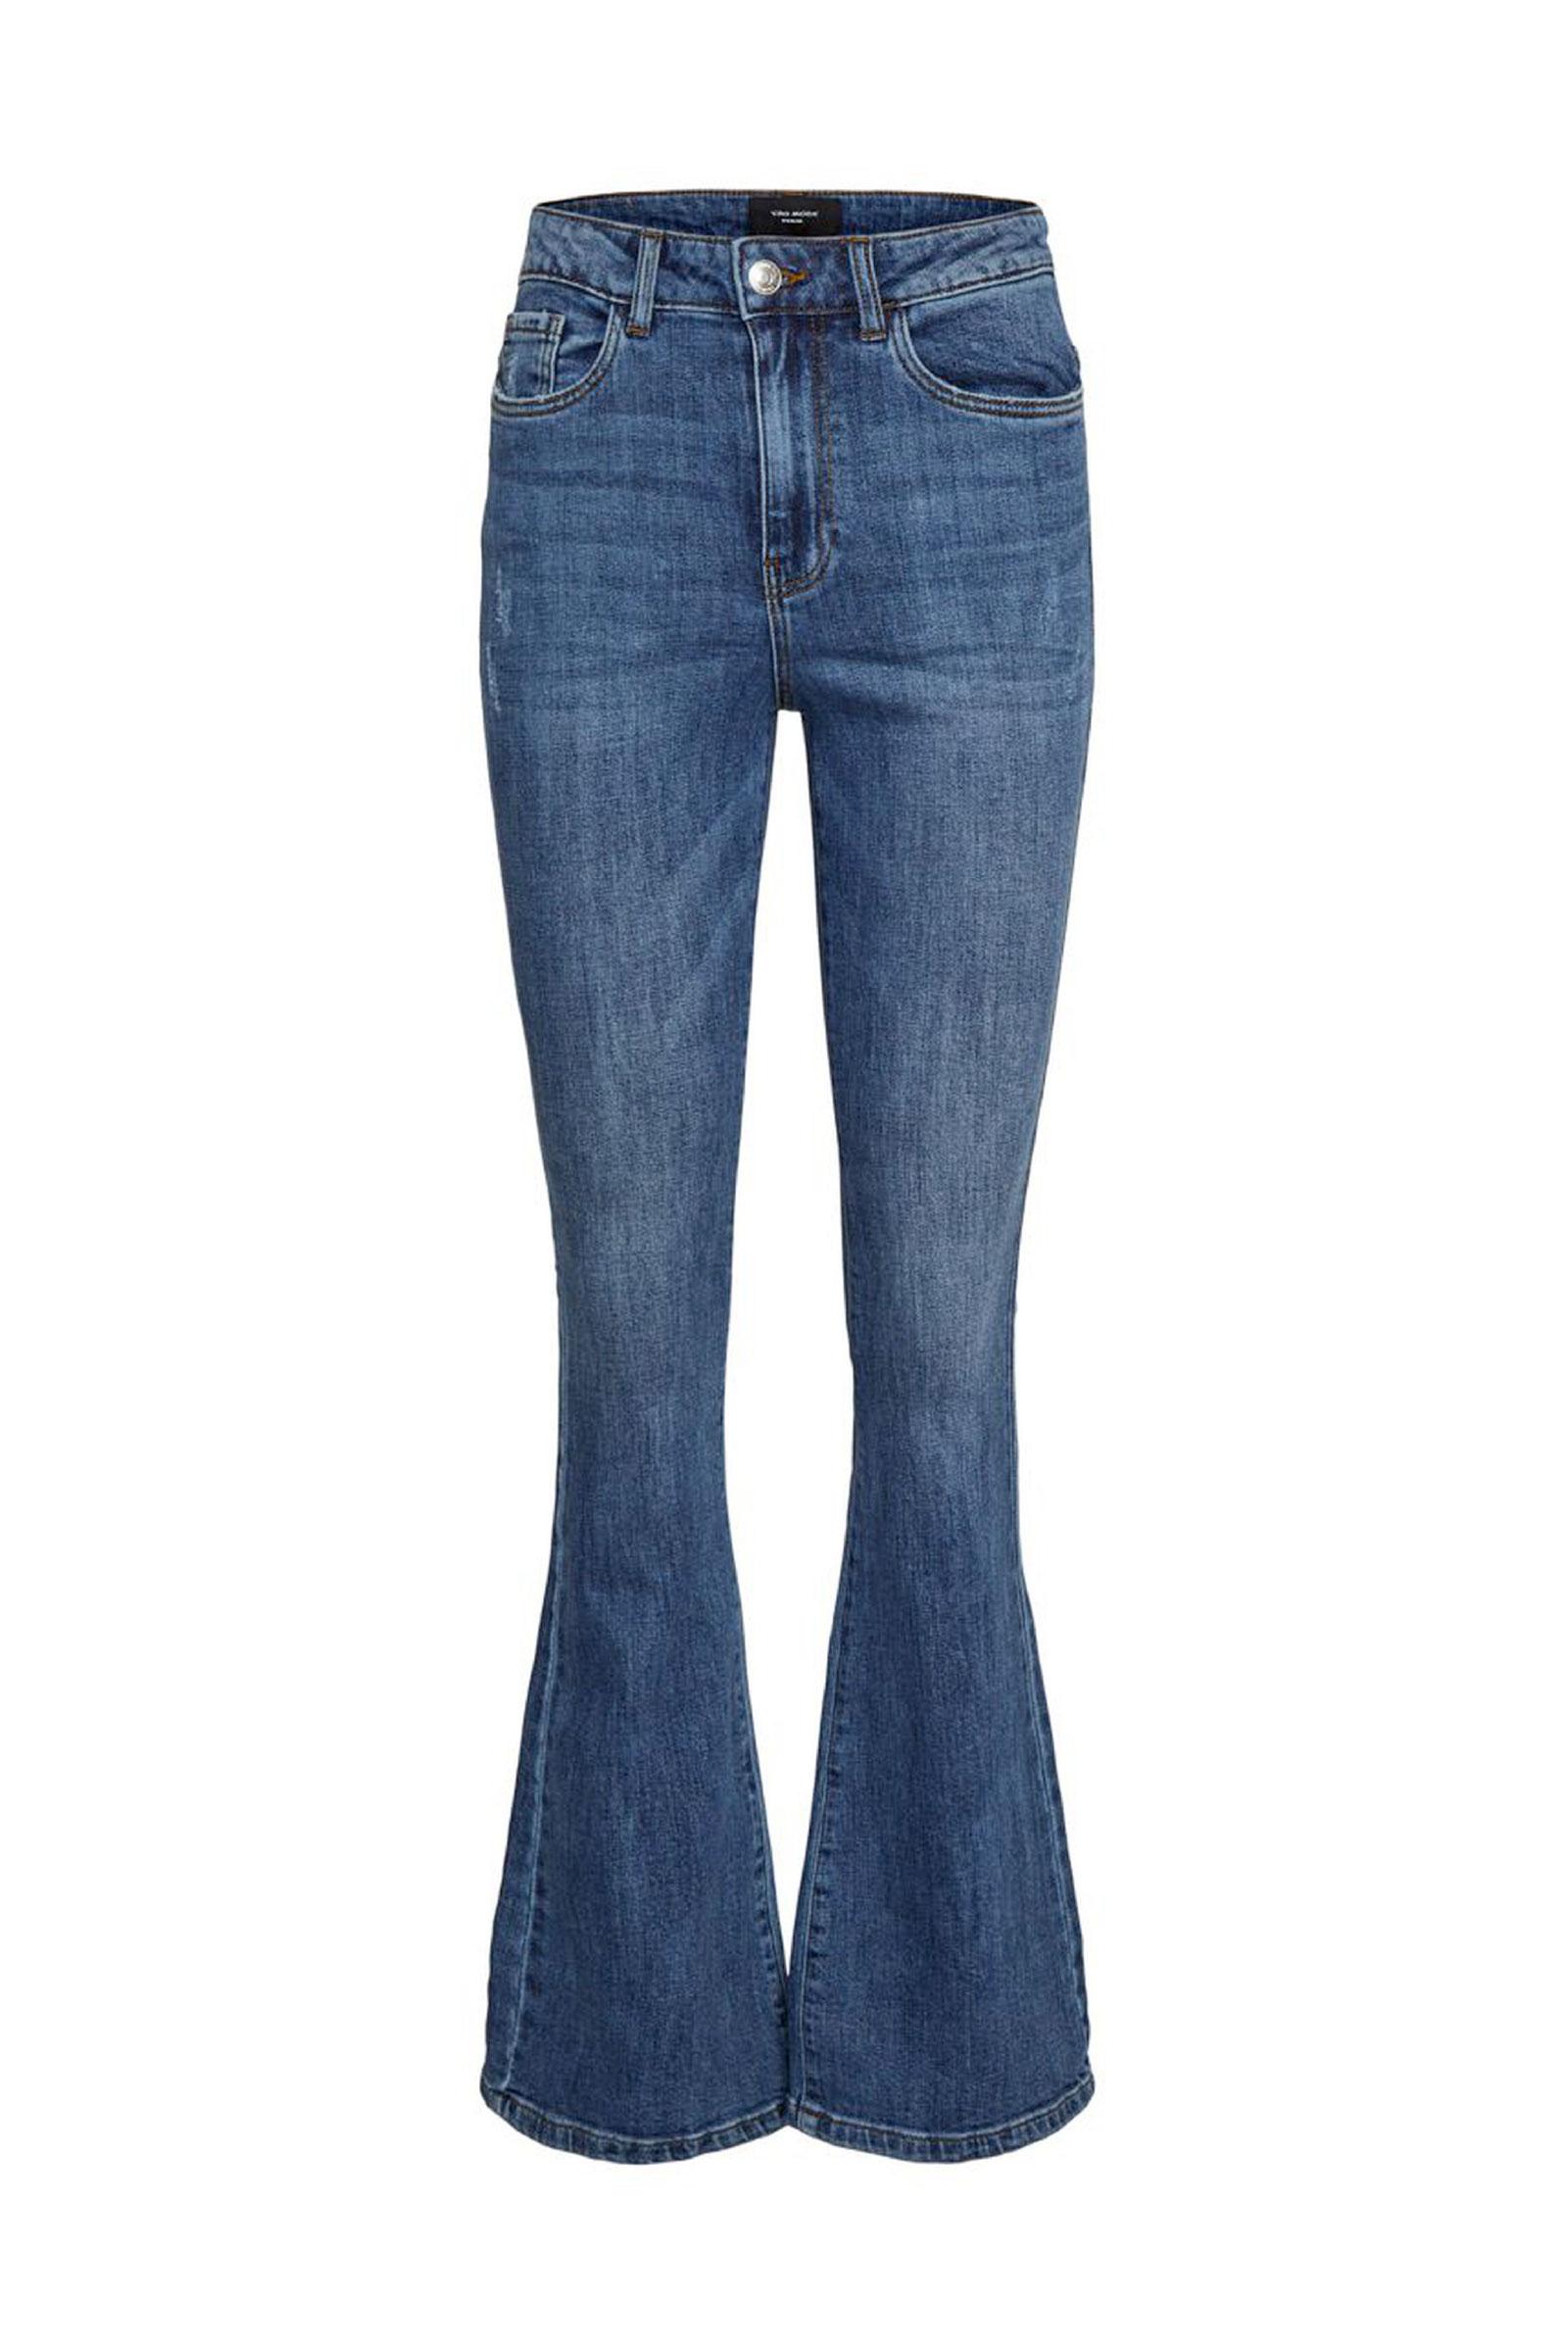 VERO MODA Jeans Donna Modello SIGA VERO MODA | Jeans | 10243667Medium Blue Denim